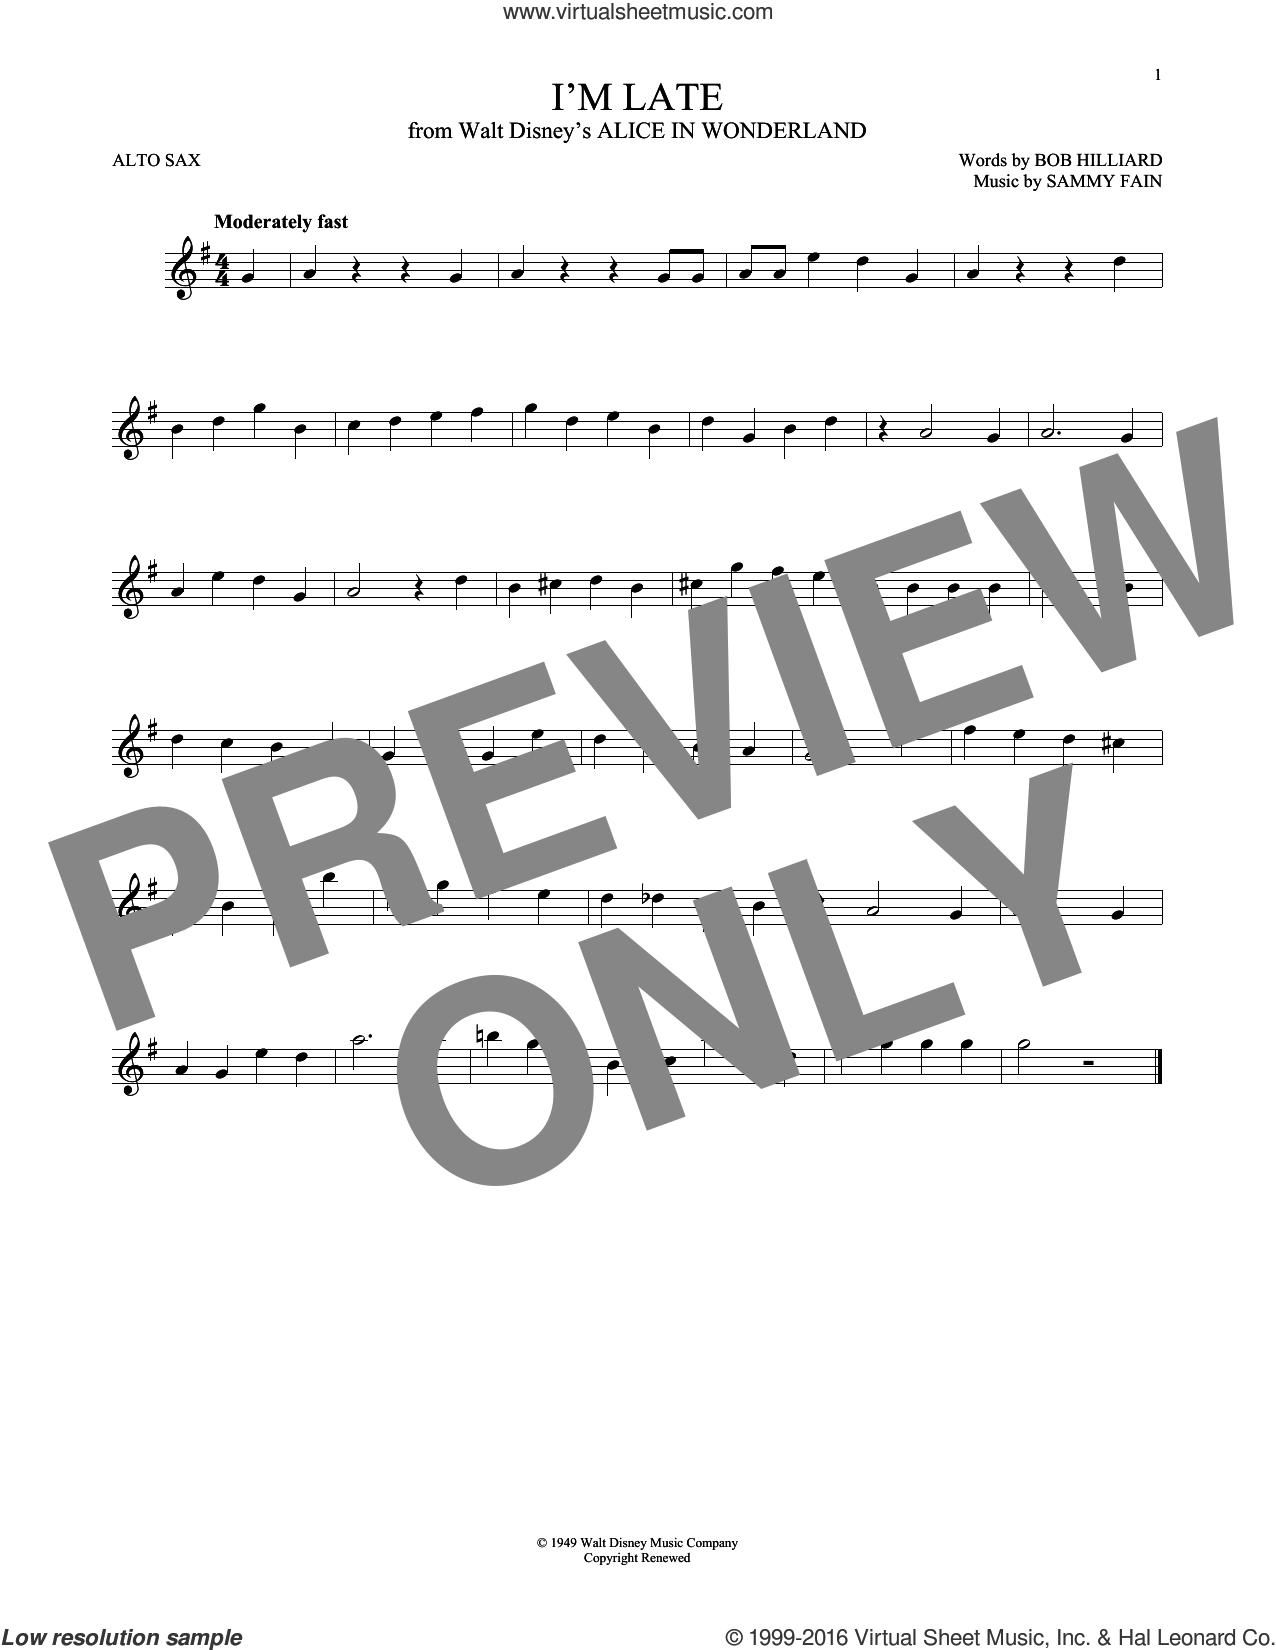 I'm Late sheet music for alto saxophone solo by Sammy Fain and Bob Hilliard, intermediate skill level